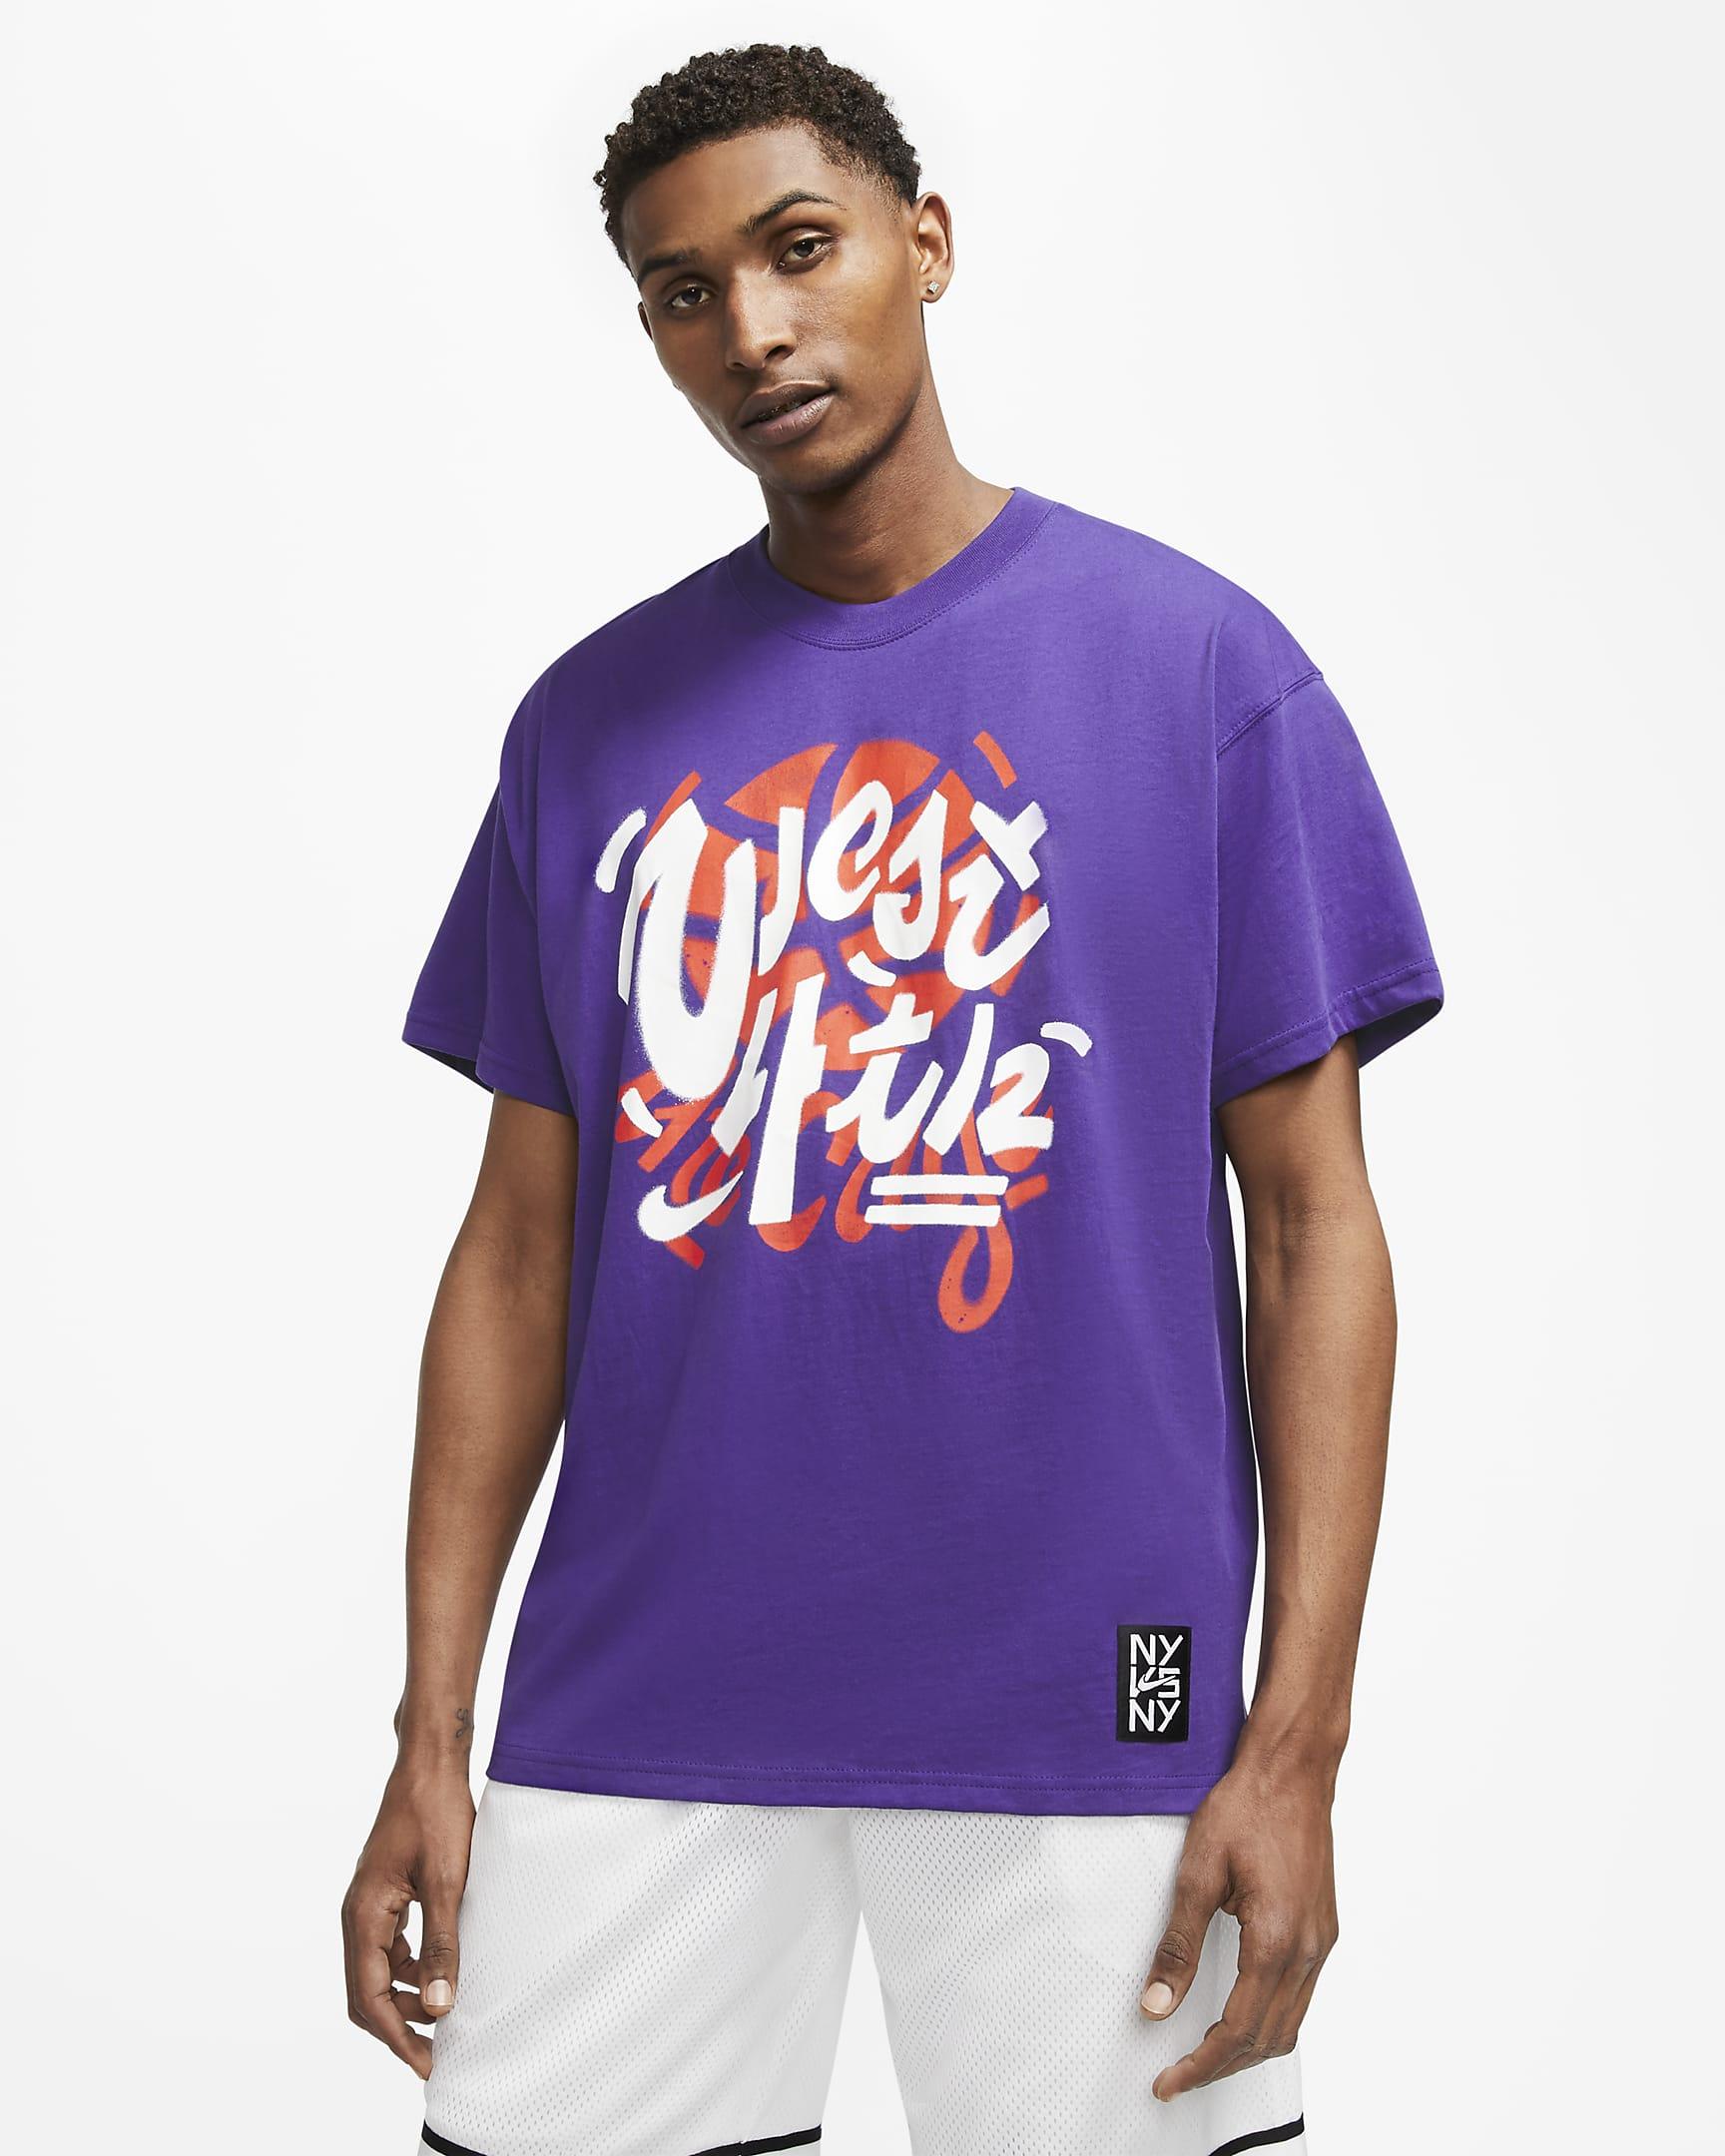 dri-fit-ny-vs-ny-west-4th-mens-basketball-t-shirt-rsvV2d.png